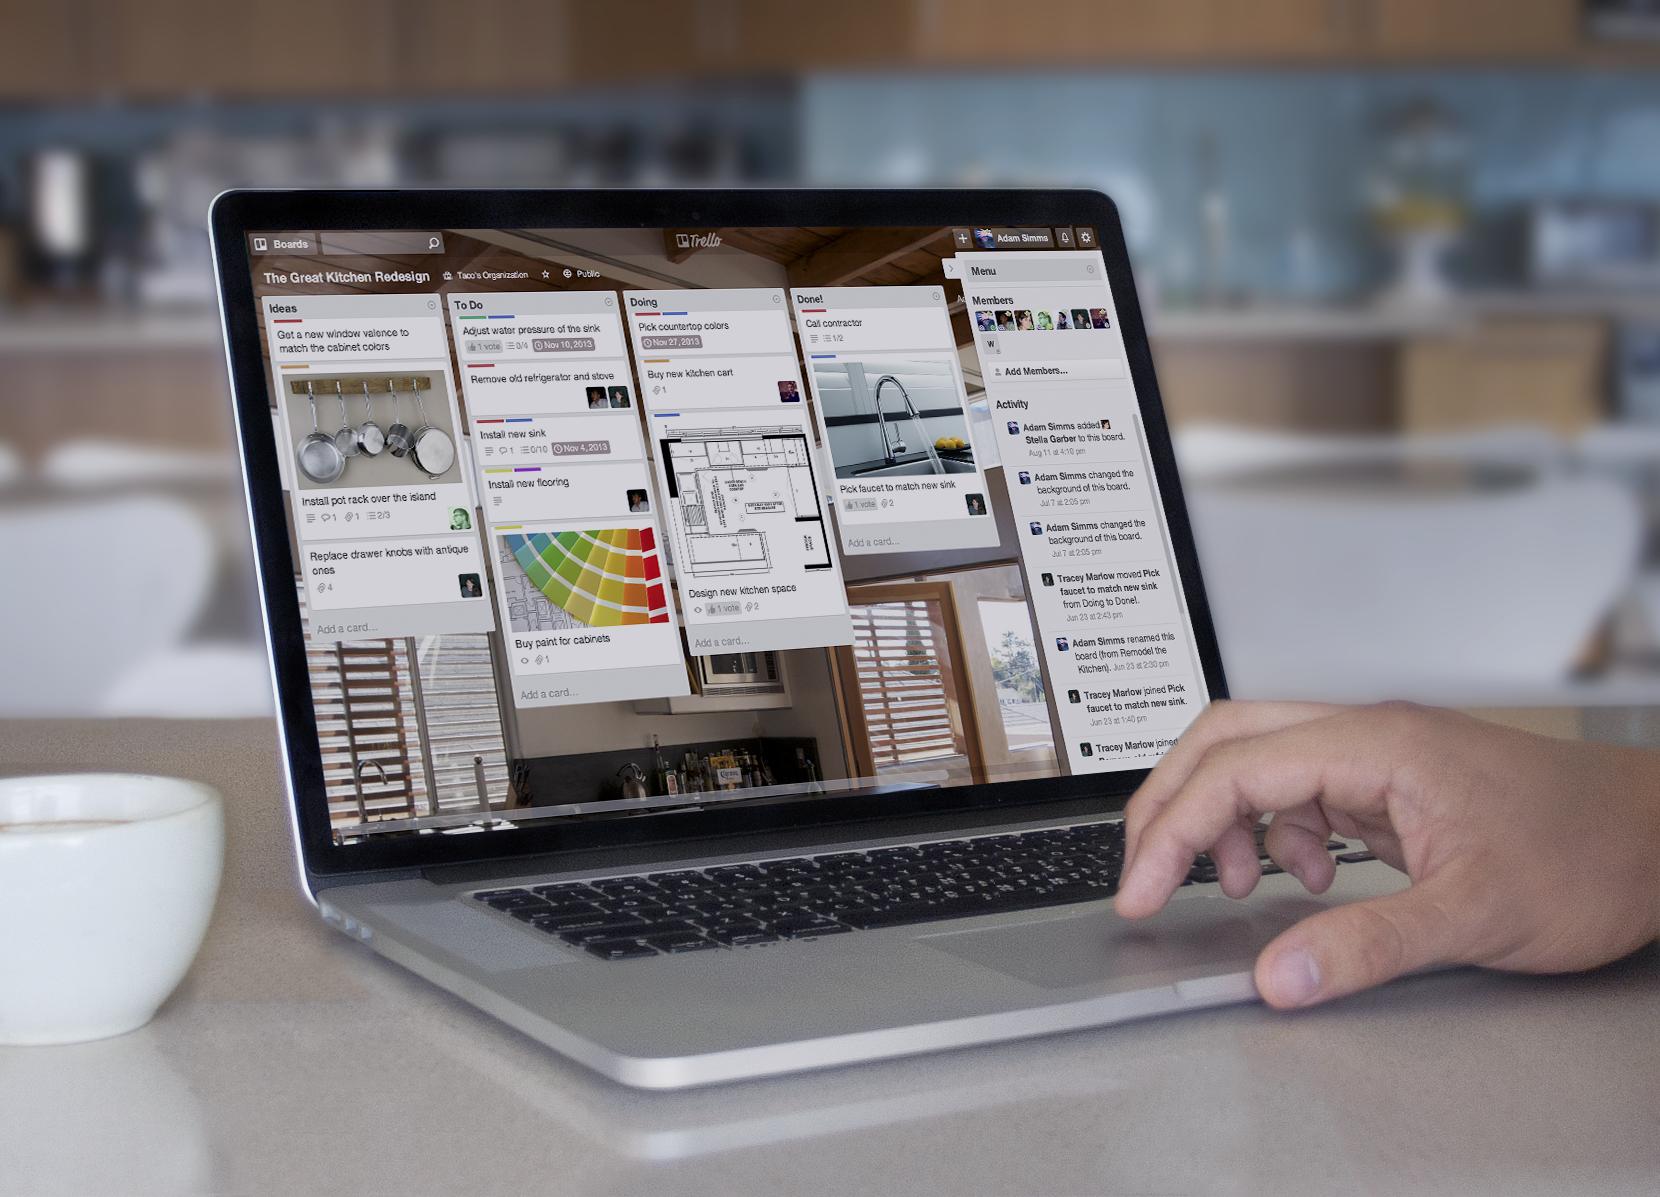 Open Macbook running Trello on a web browser